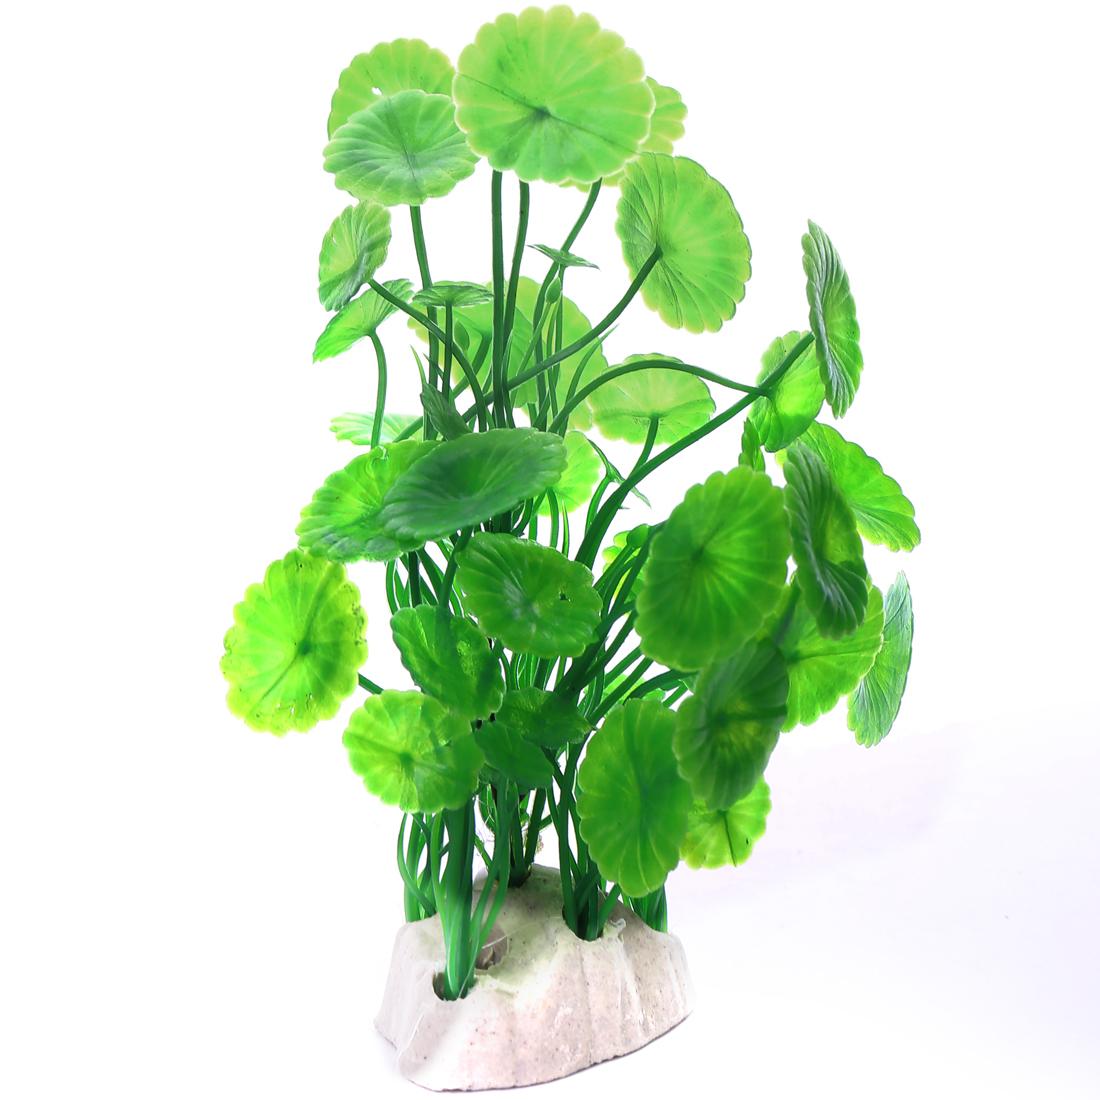 max 15cm long green leaf Aquarium Plants Fish Tank Plastic Decoration